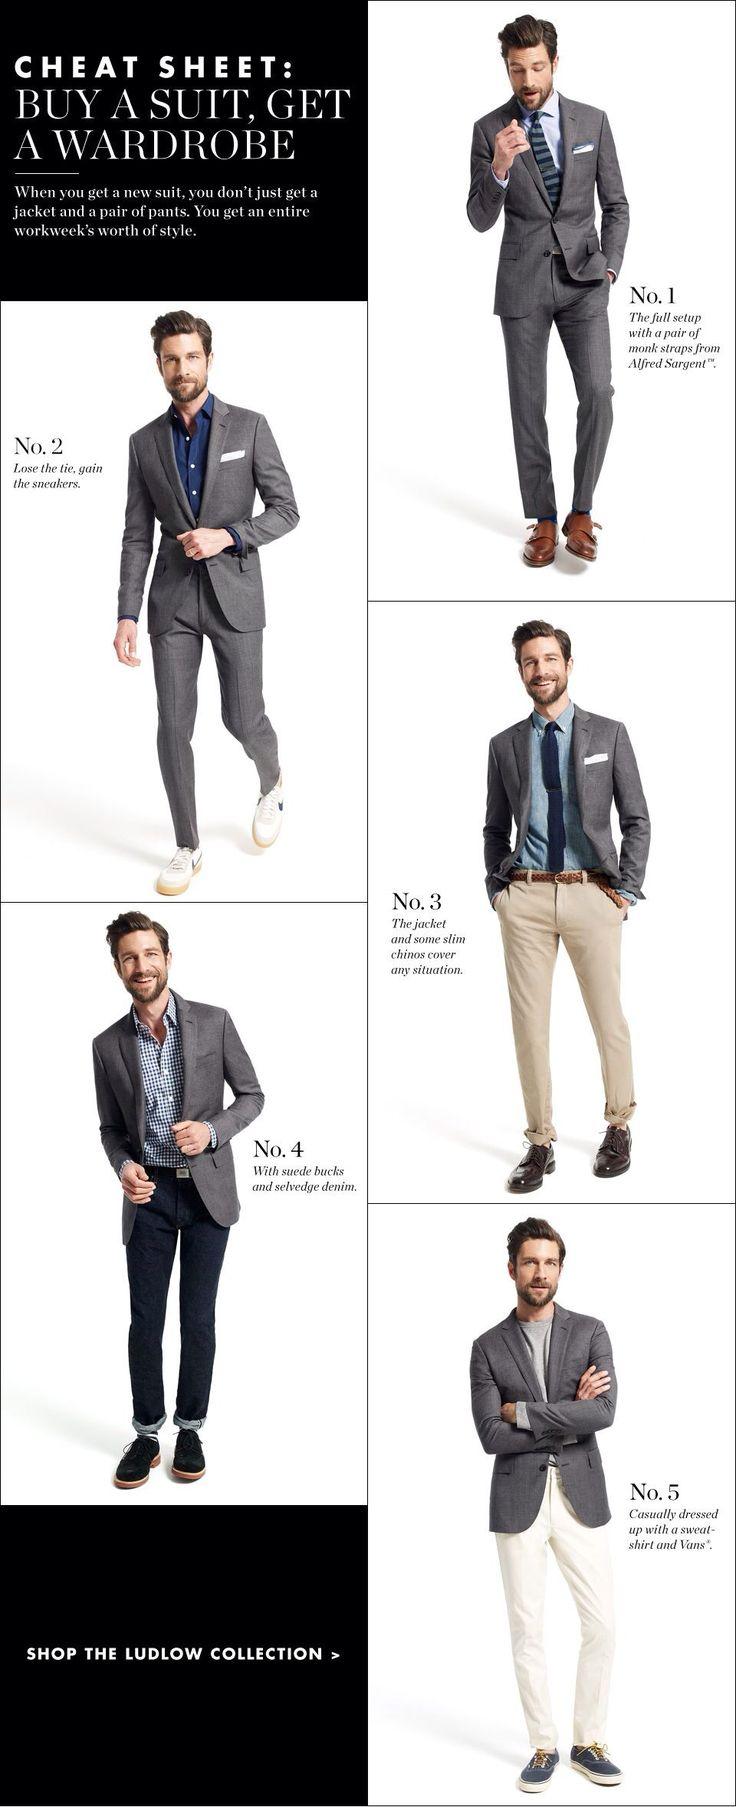 One suit 5 looks